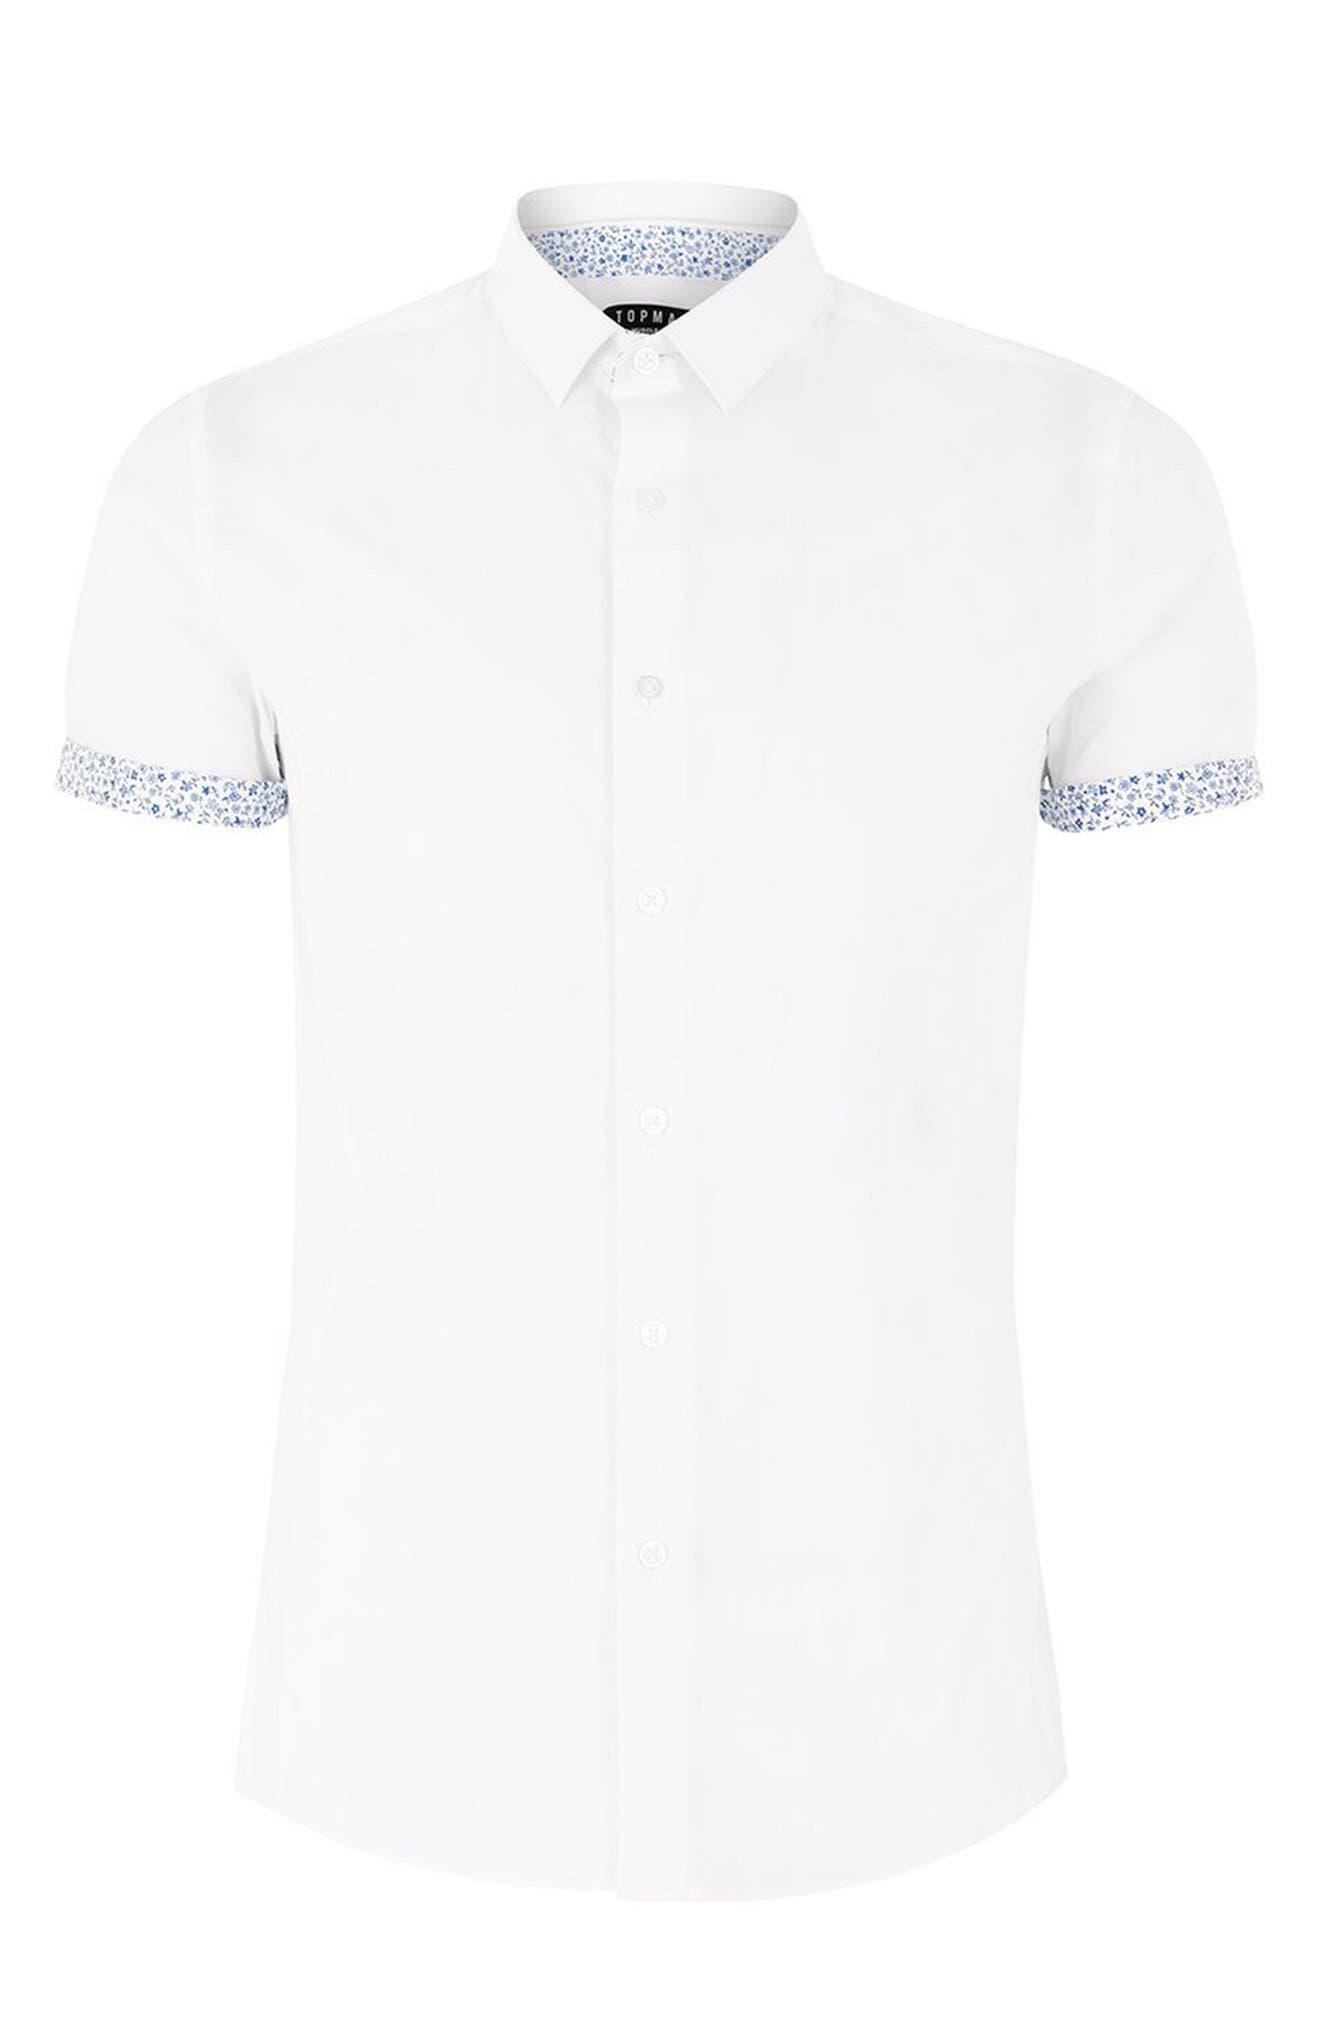 Muscle Fit Floral Trim Shirt,                             Alternate thumbnail 4, color,                             White Multi